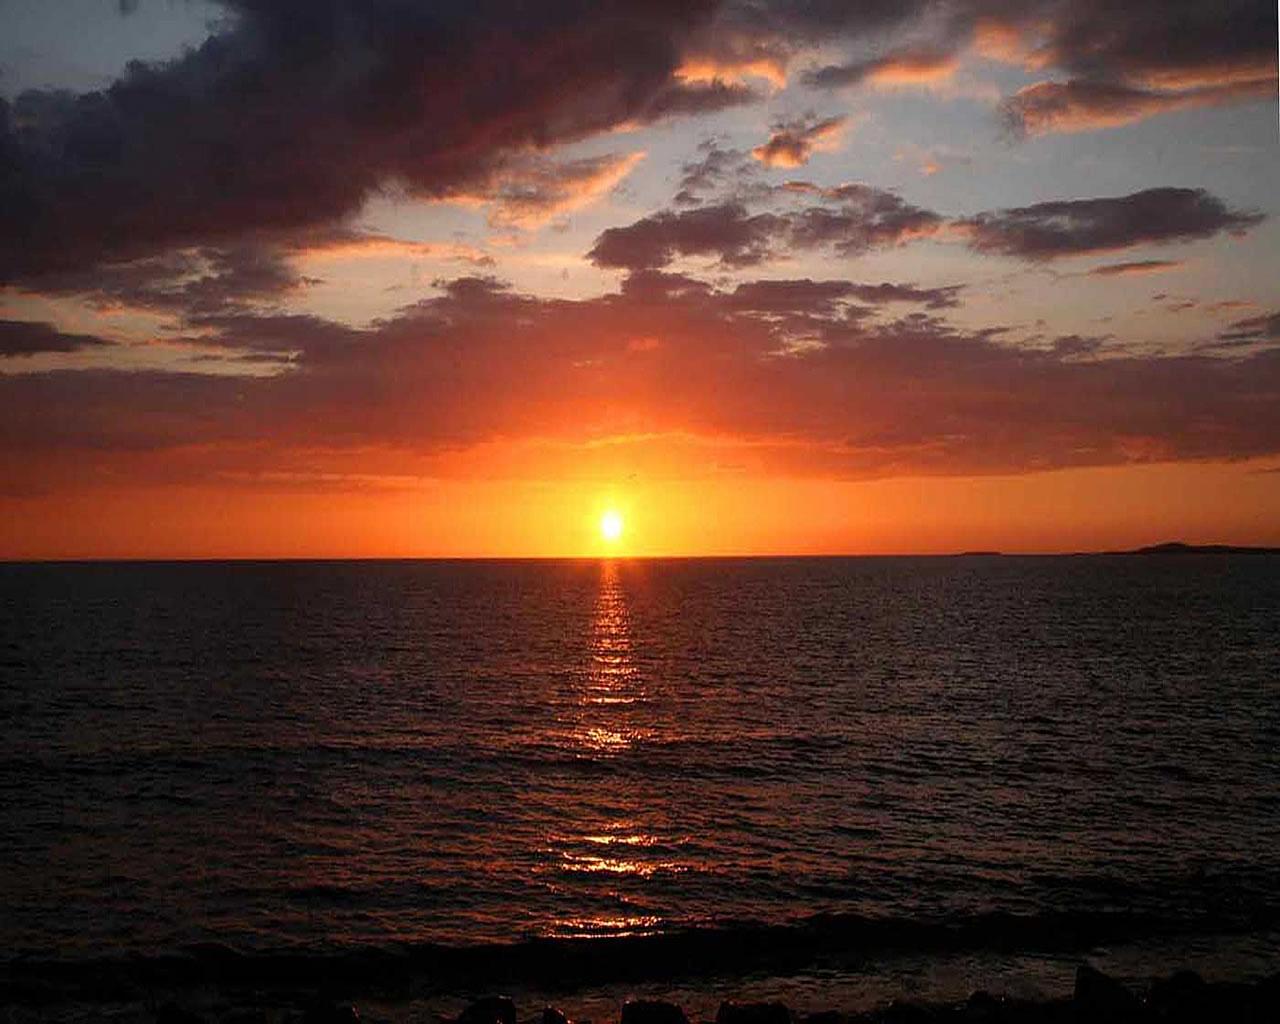 Summer Solstice strandhill ireland 1280x1024